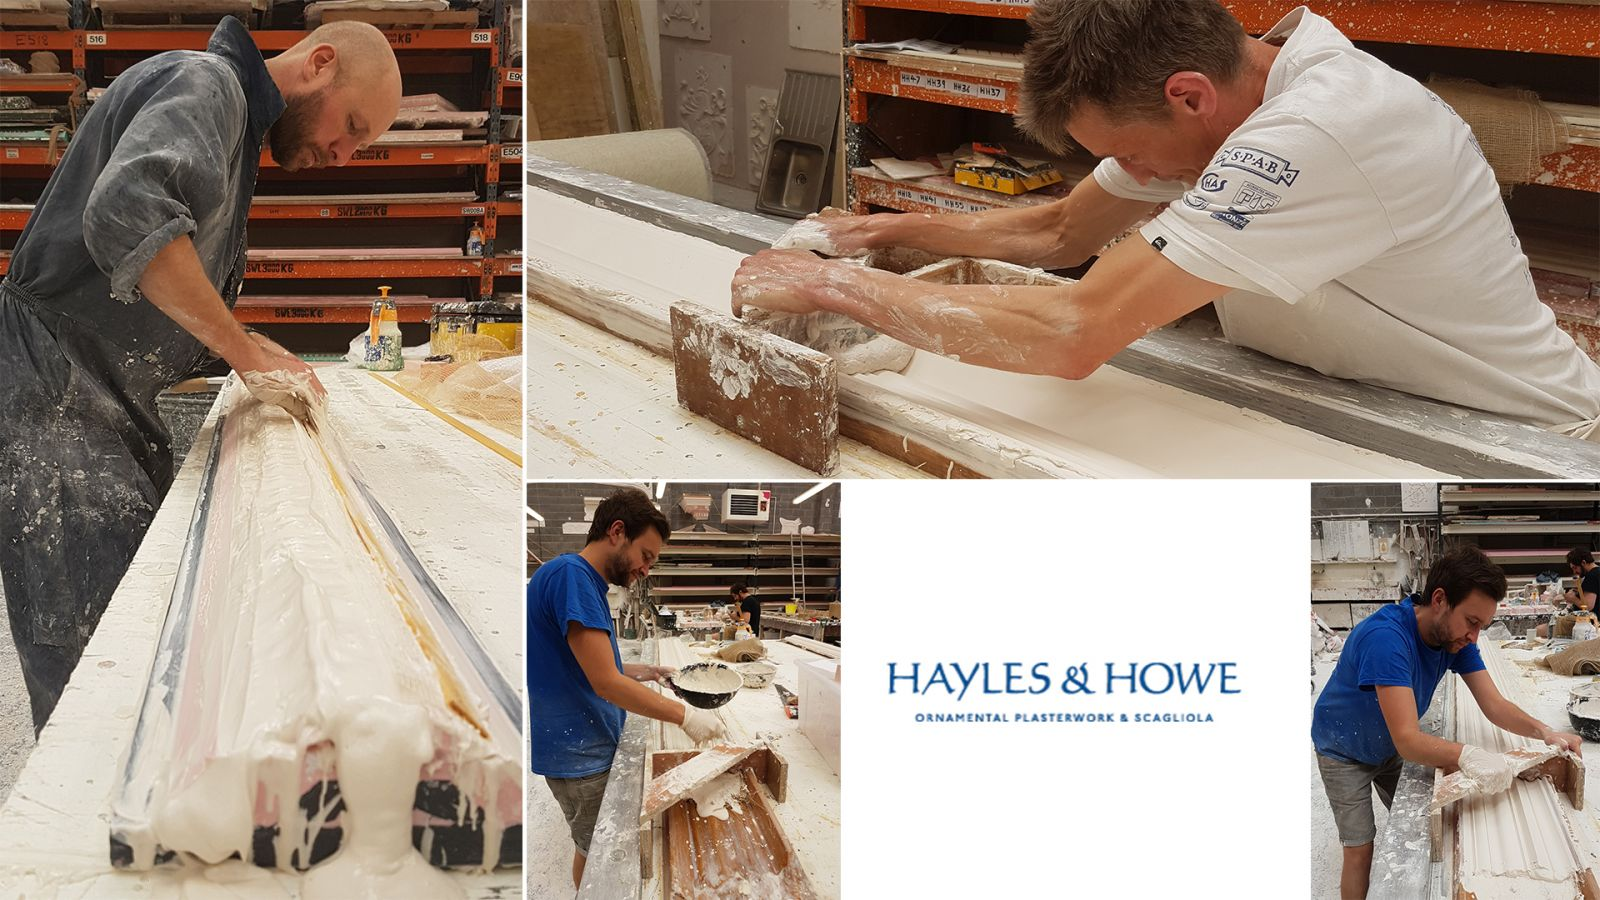 Hayles and Howe